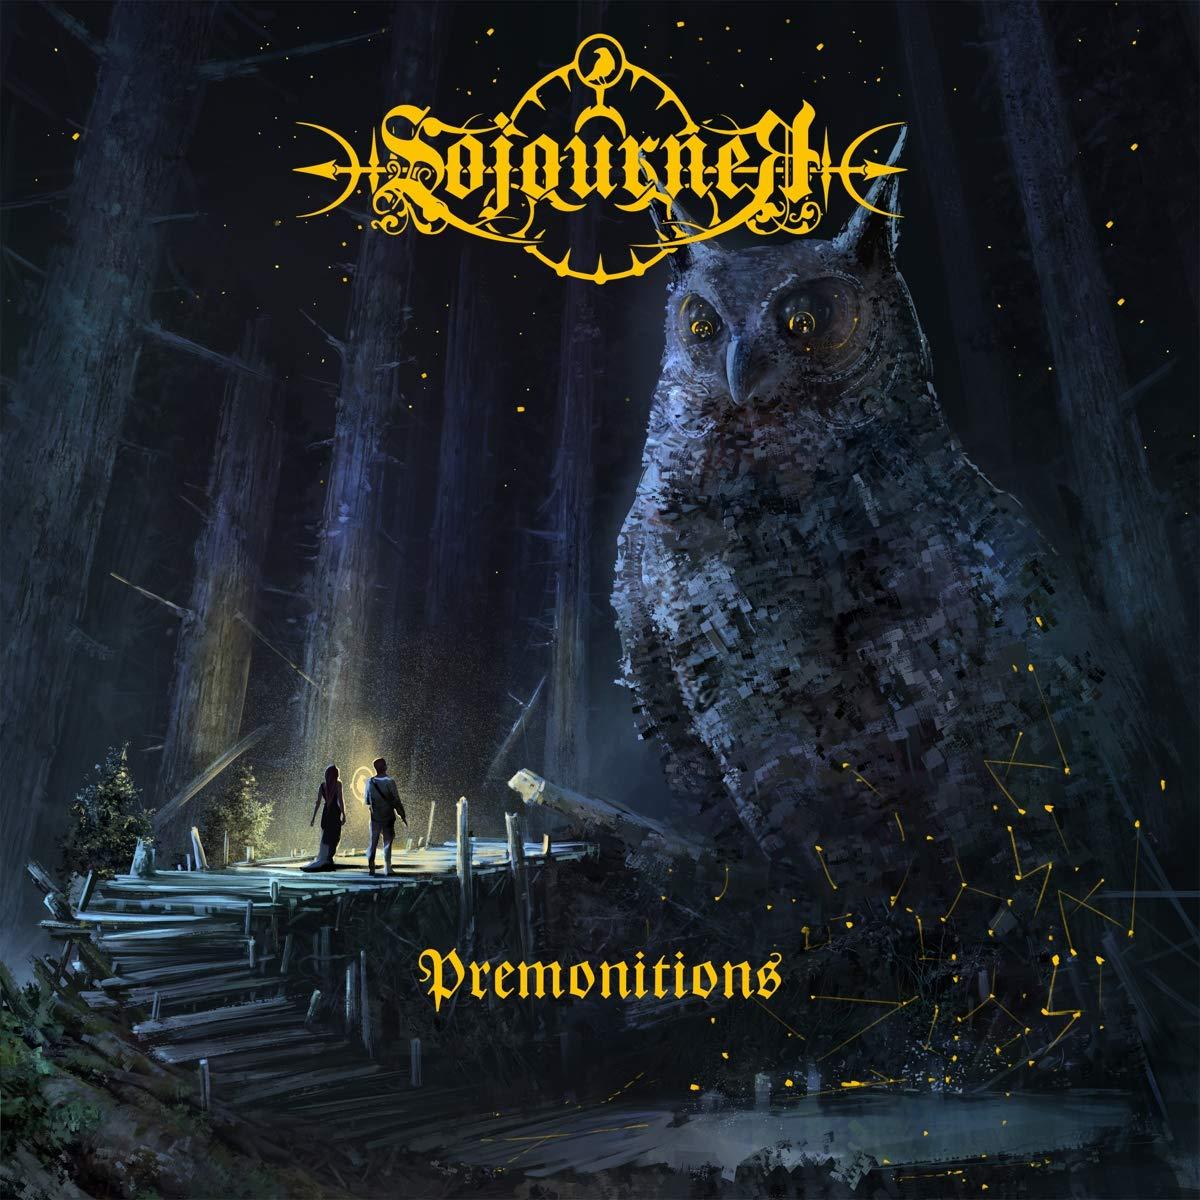 Sojourner - Premonitions (2020) [FLAC] Download